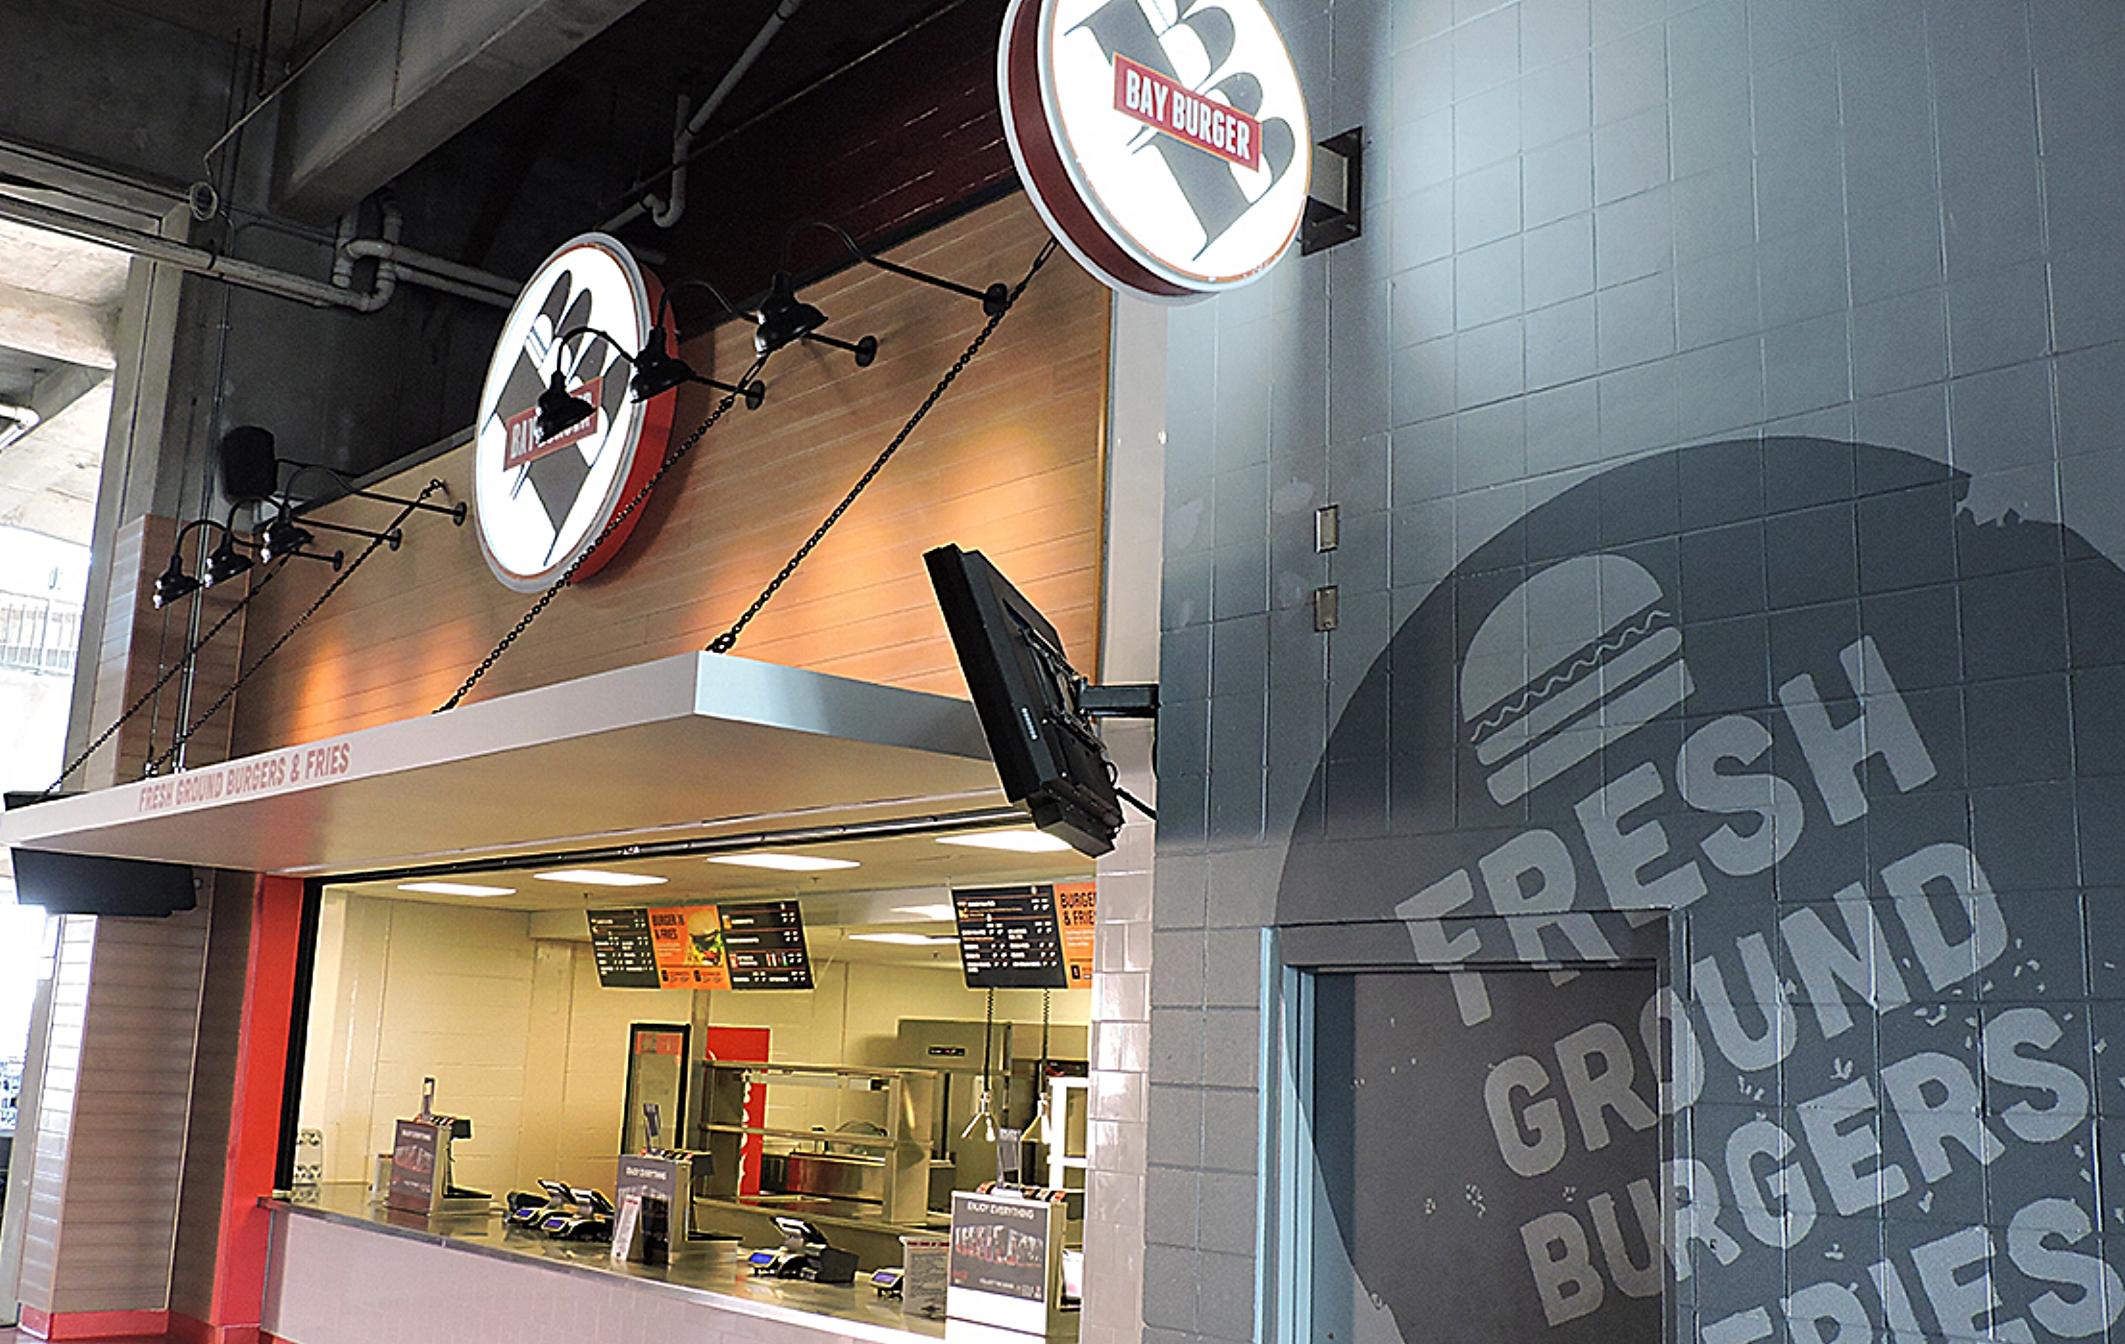 FL-Retail-Bay Burger 2.jpg